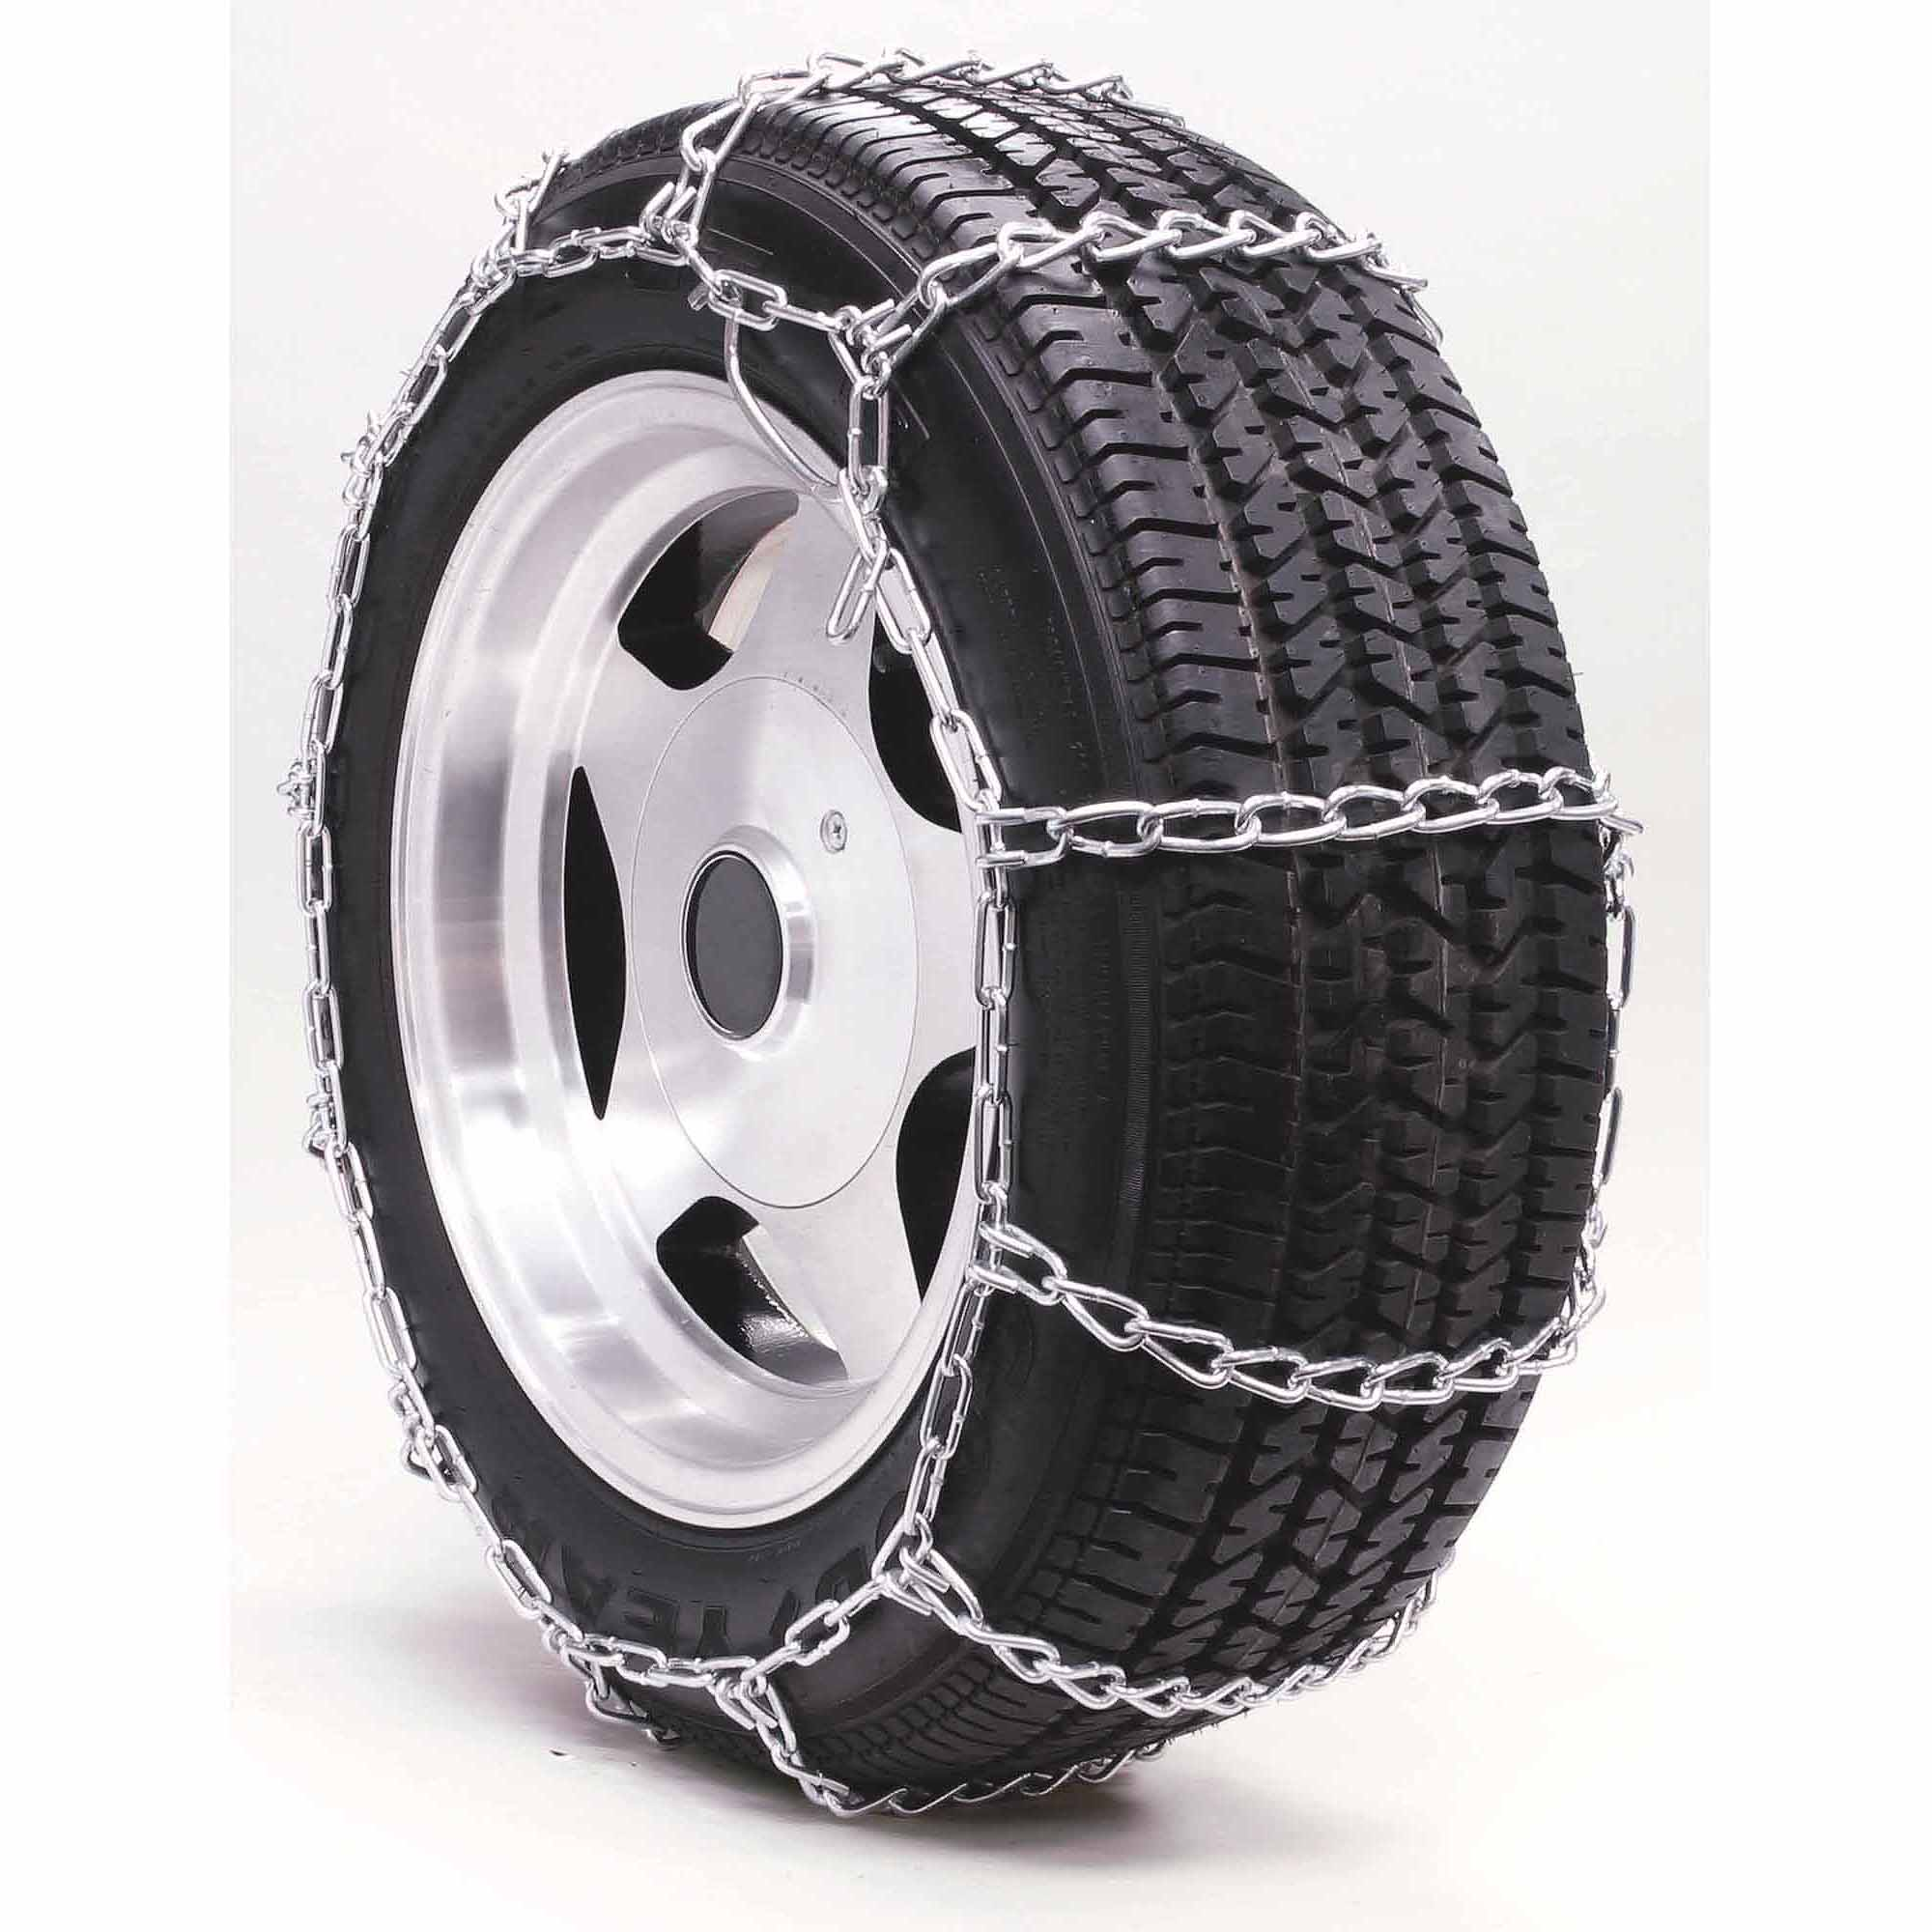 Peerless Chain Passenger Tire Chains, #0112210 by Peerless Chain Company